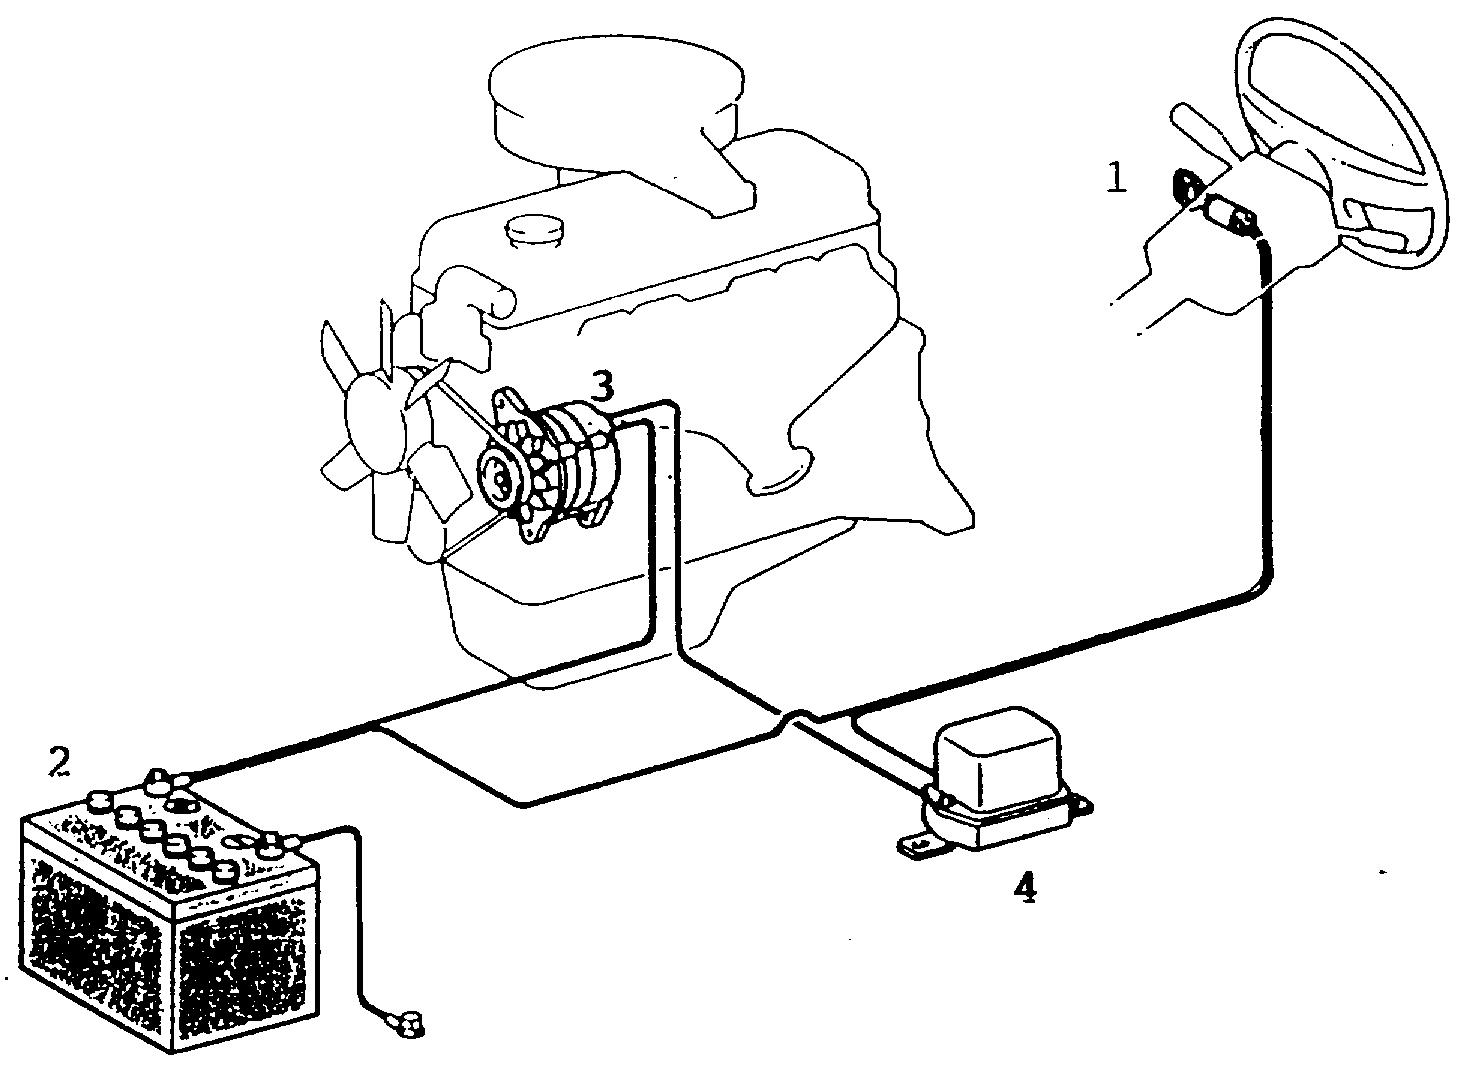 Tugas Instalasi Listrik 2 as well Sistem Pengisian as well Kalibrasi Controler besides Merakit Sendiri Panel Listrik 3 Phasa likewise Rangkaian Motor Tiga Fasa Dengan Saklar. on untuk wiring diagram listrik